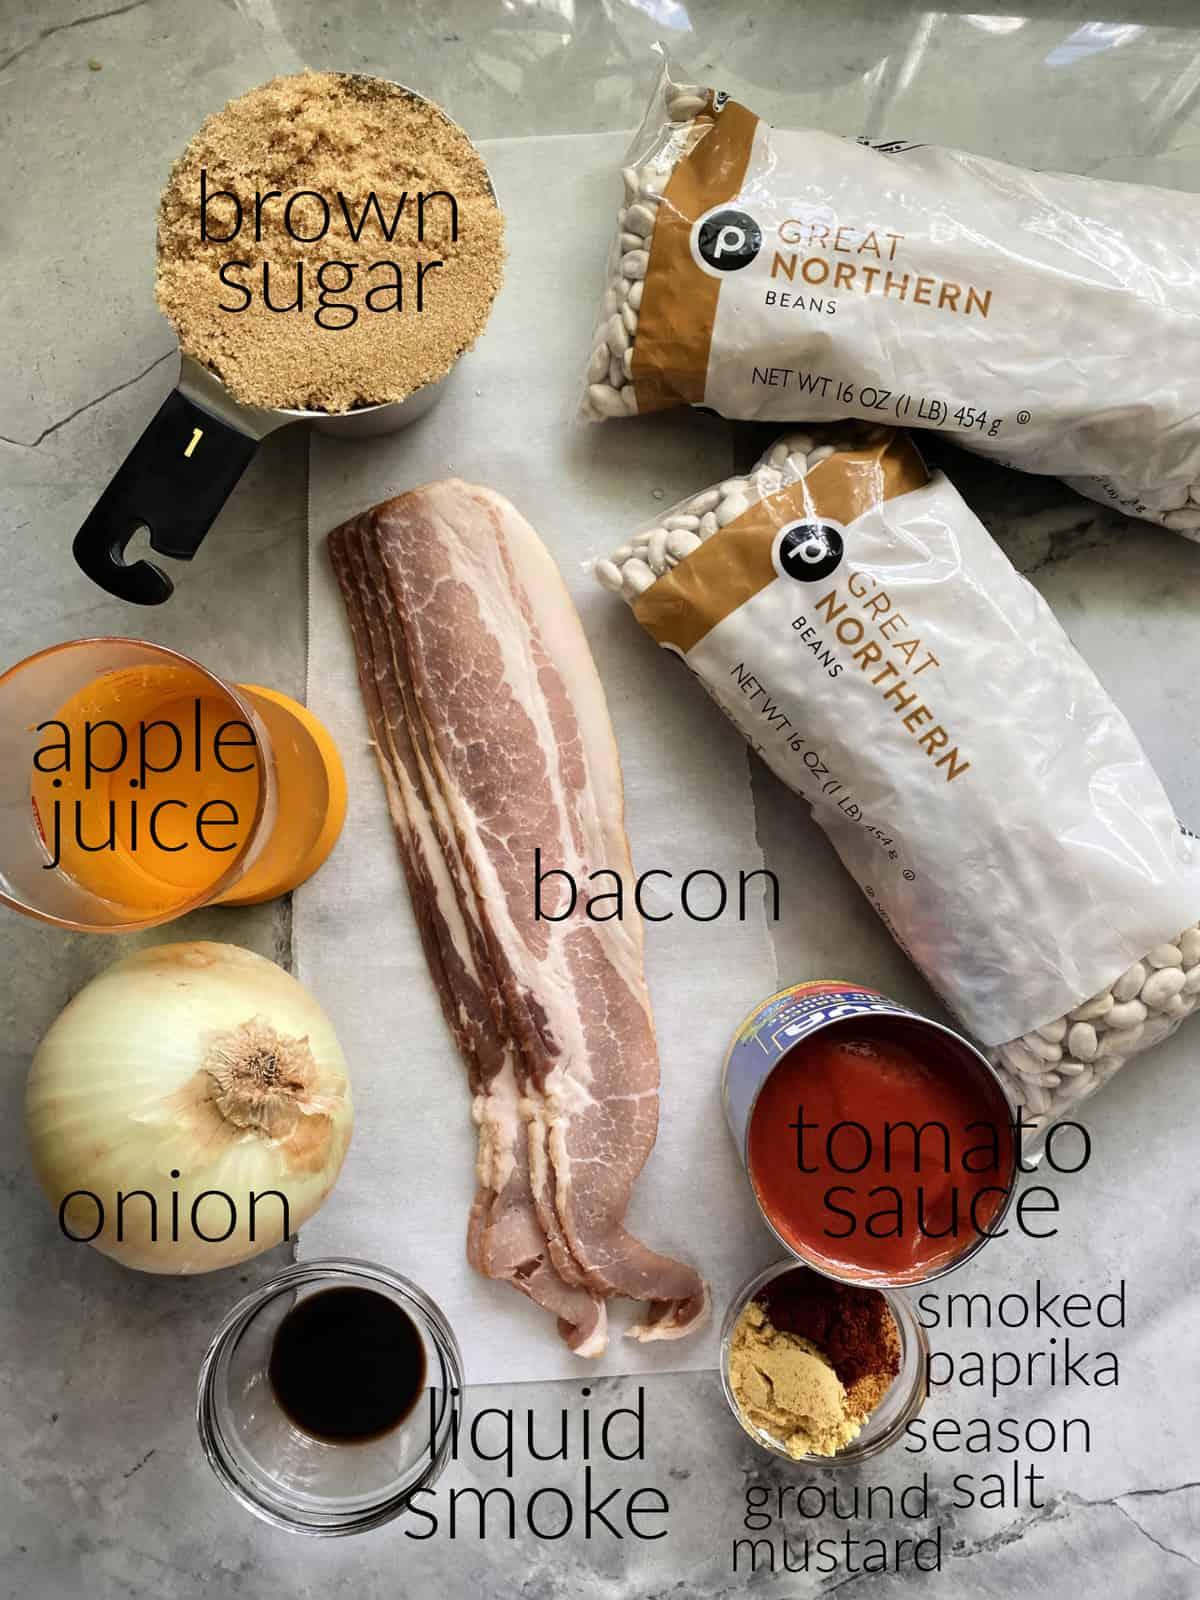 Ingredients: brown sugar, great northern beans, bacon,apple juice, onion, liquid smoke, tomato sauce, and seasonings.